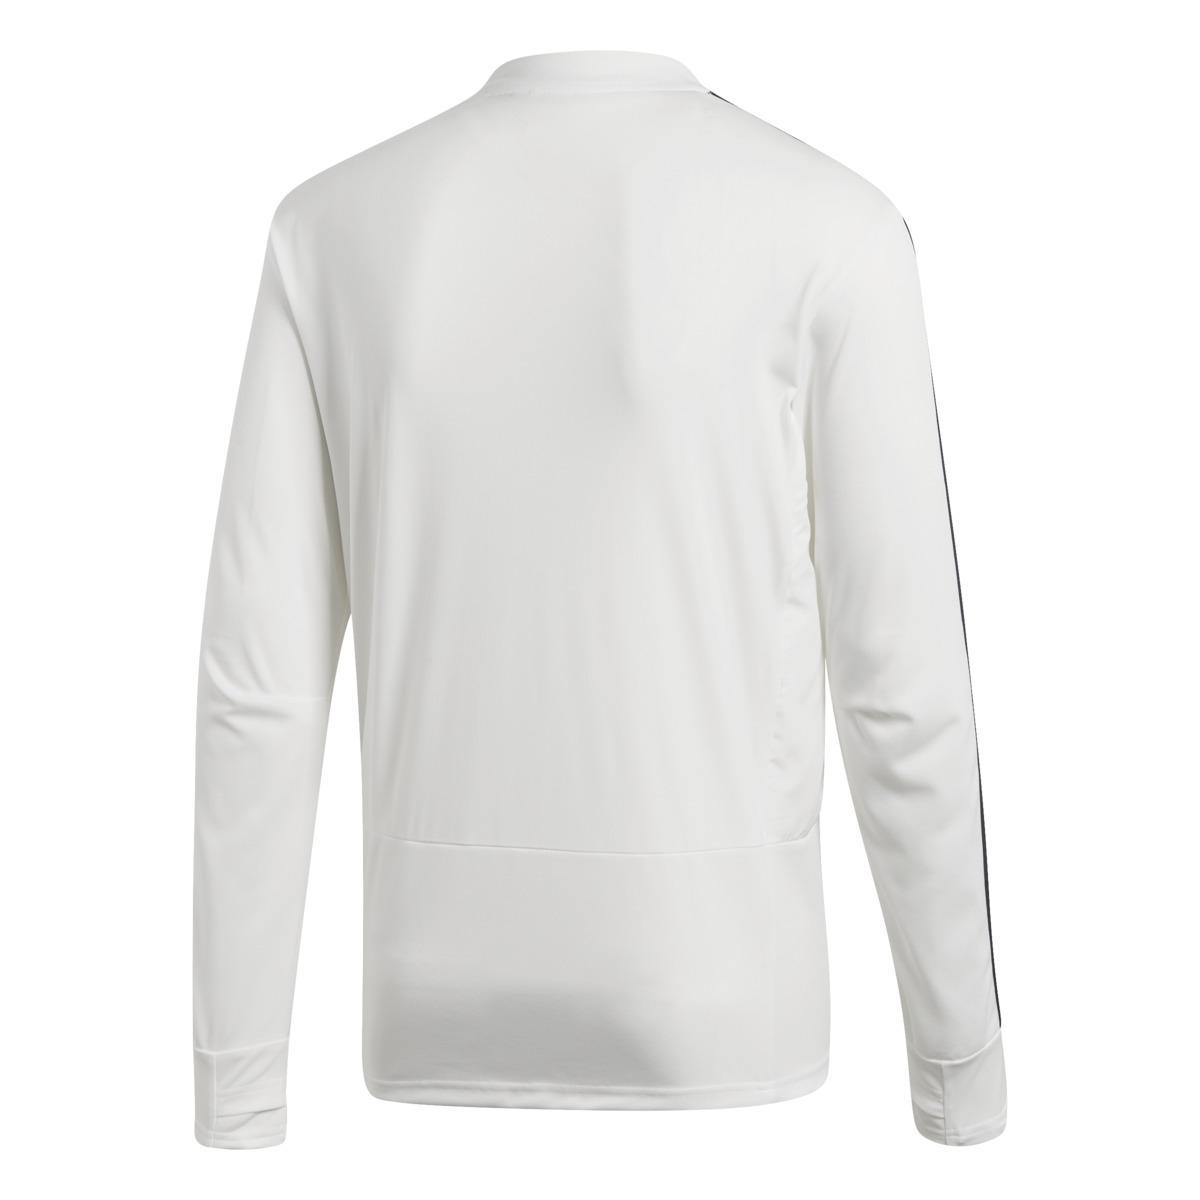 b75627b1200 Adidas - White Real Madrid Cf 2018-2019 Training Shirt for Men - Lyst. View  fullscreen